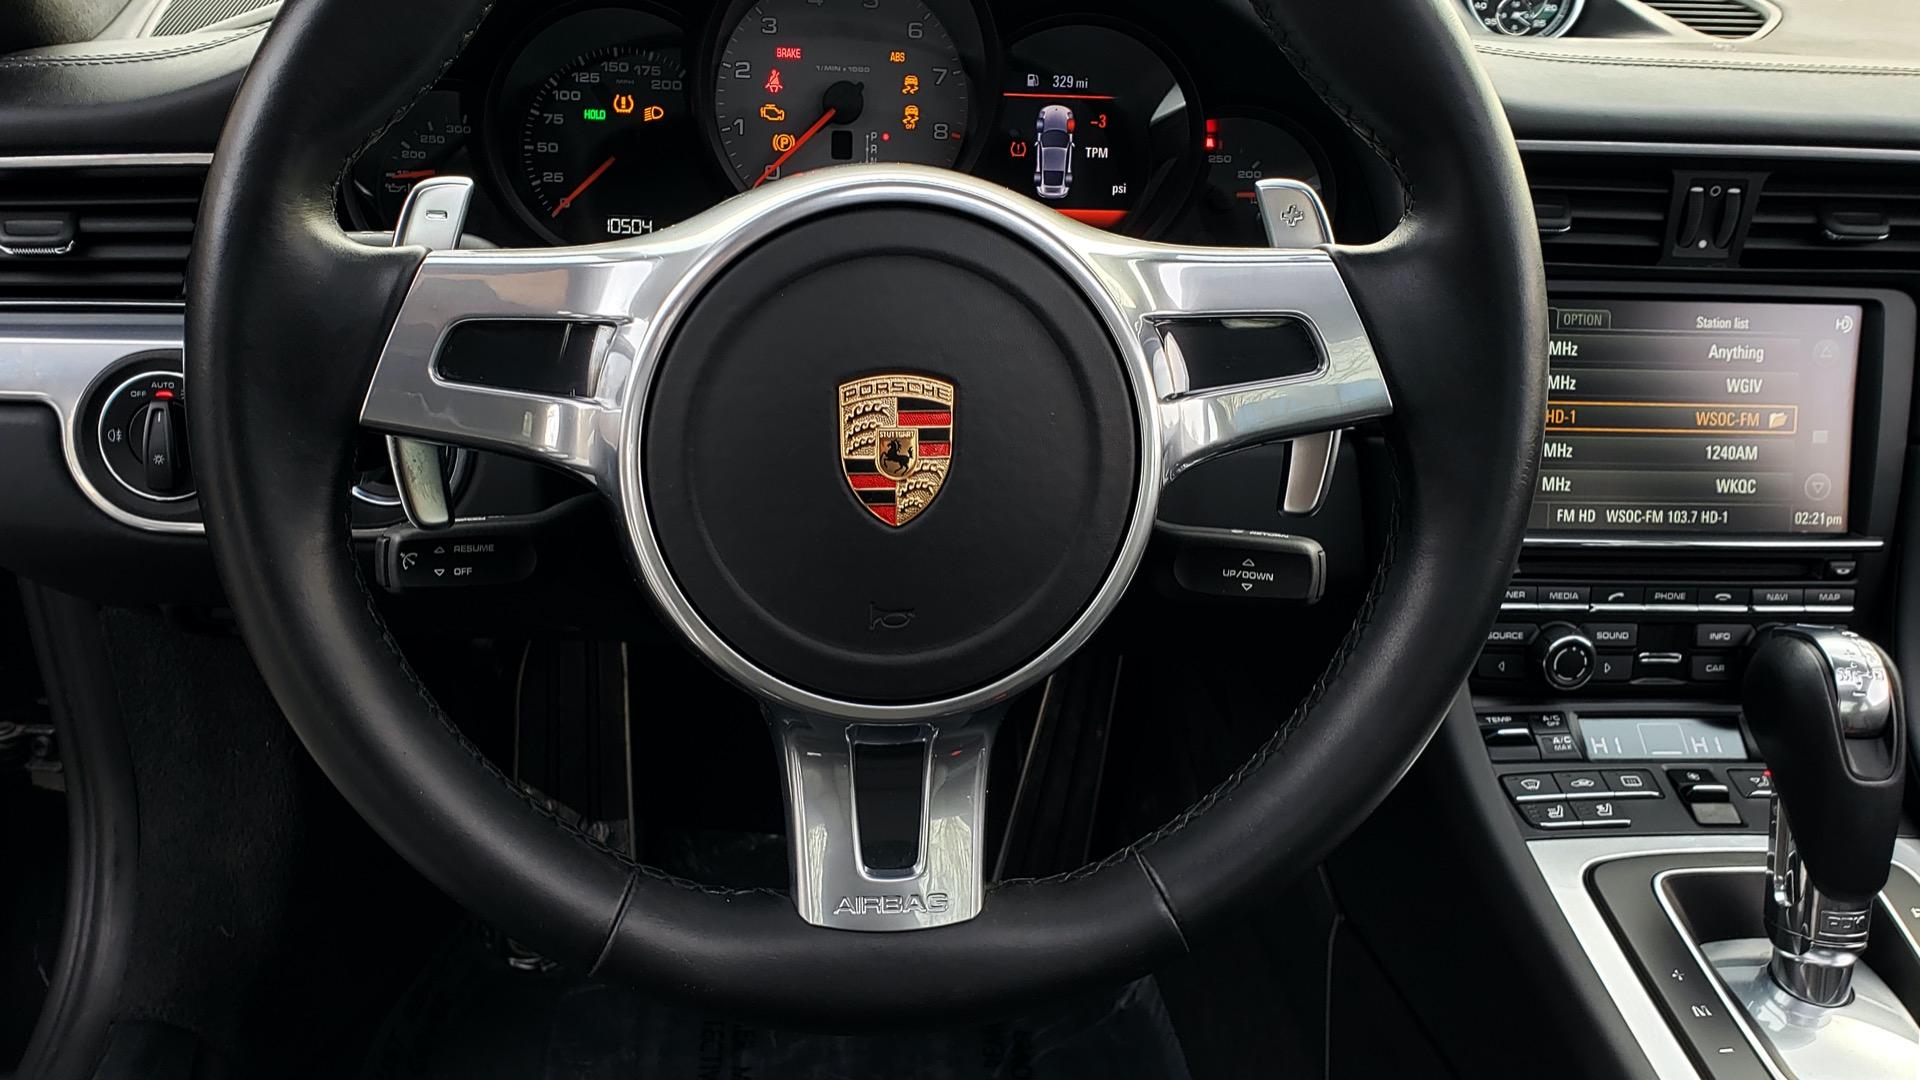 Used 2014 Porsche 911 CARRERA 4S / PREM PKG PLUS / NAV / SUNROO / BOSE / CHRONO for sale Sold at Formula Imports in Charlotte NC 28227 40